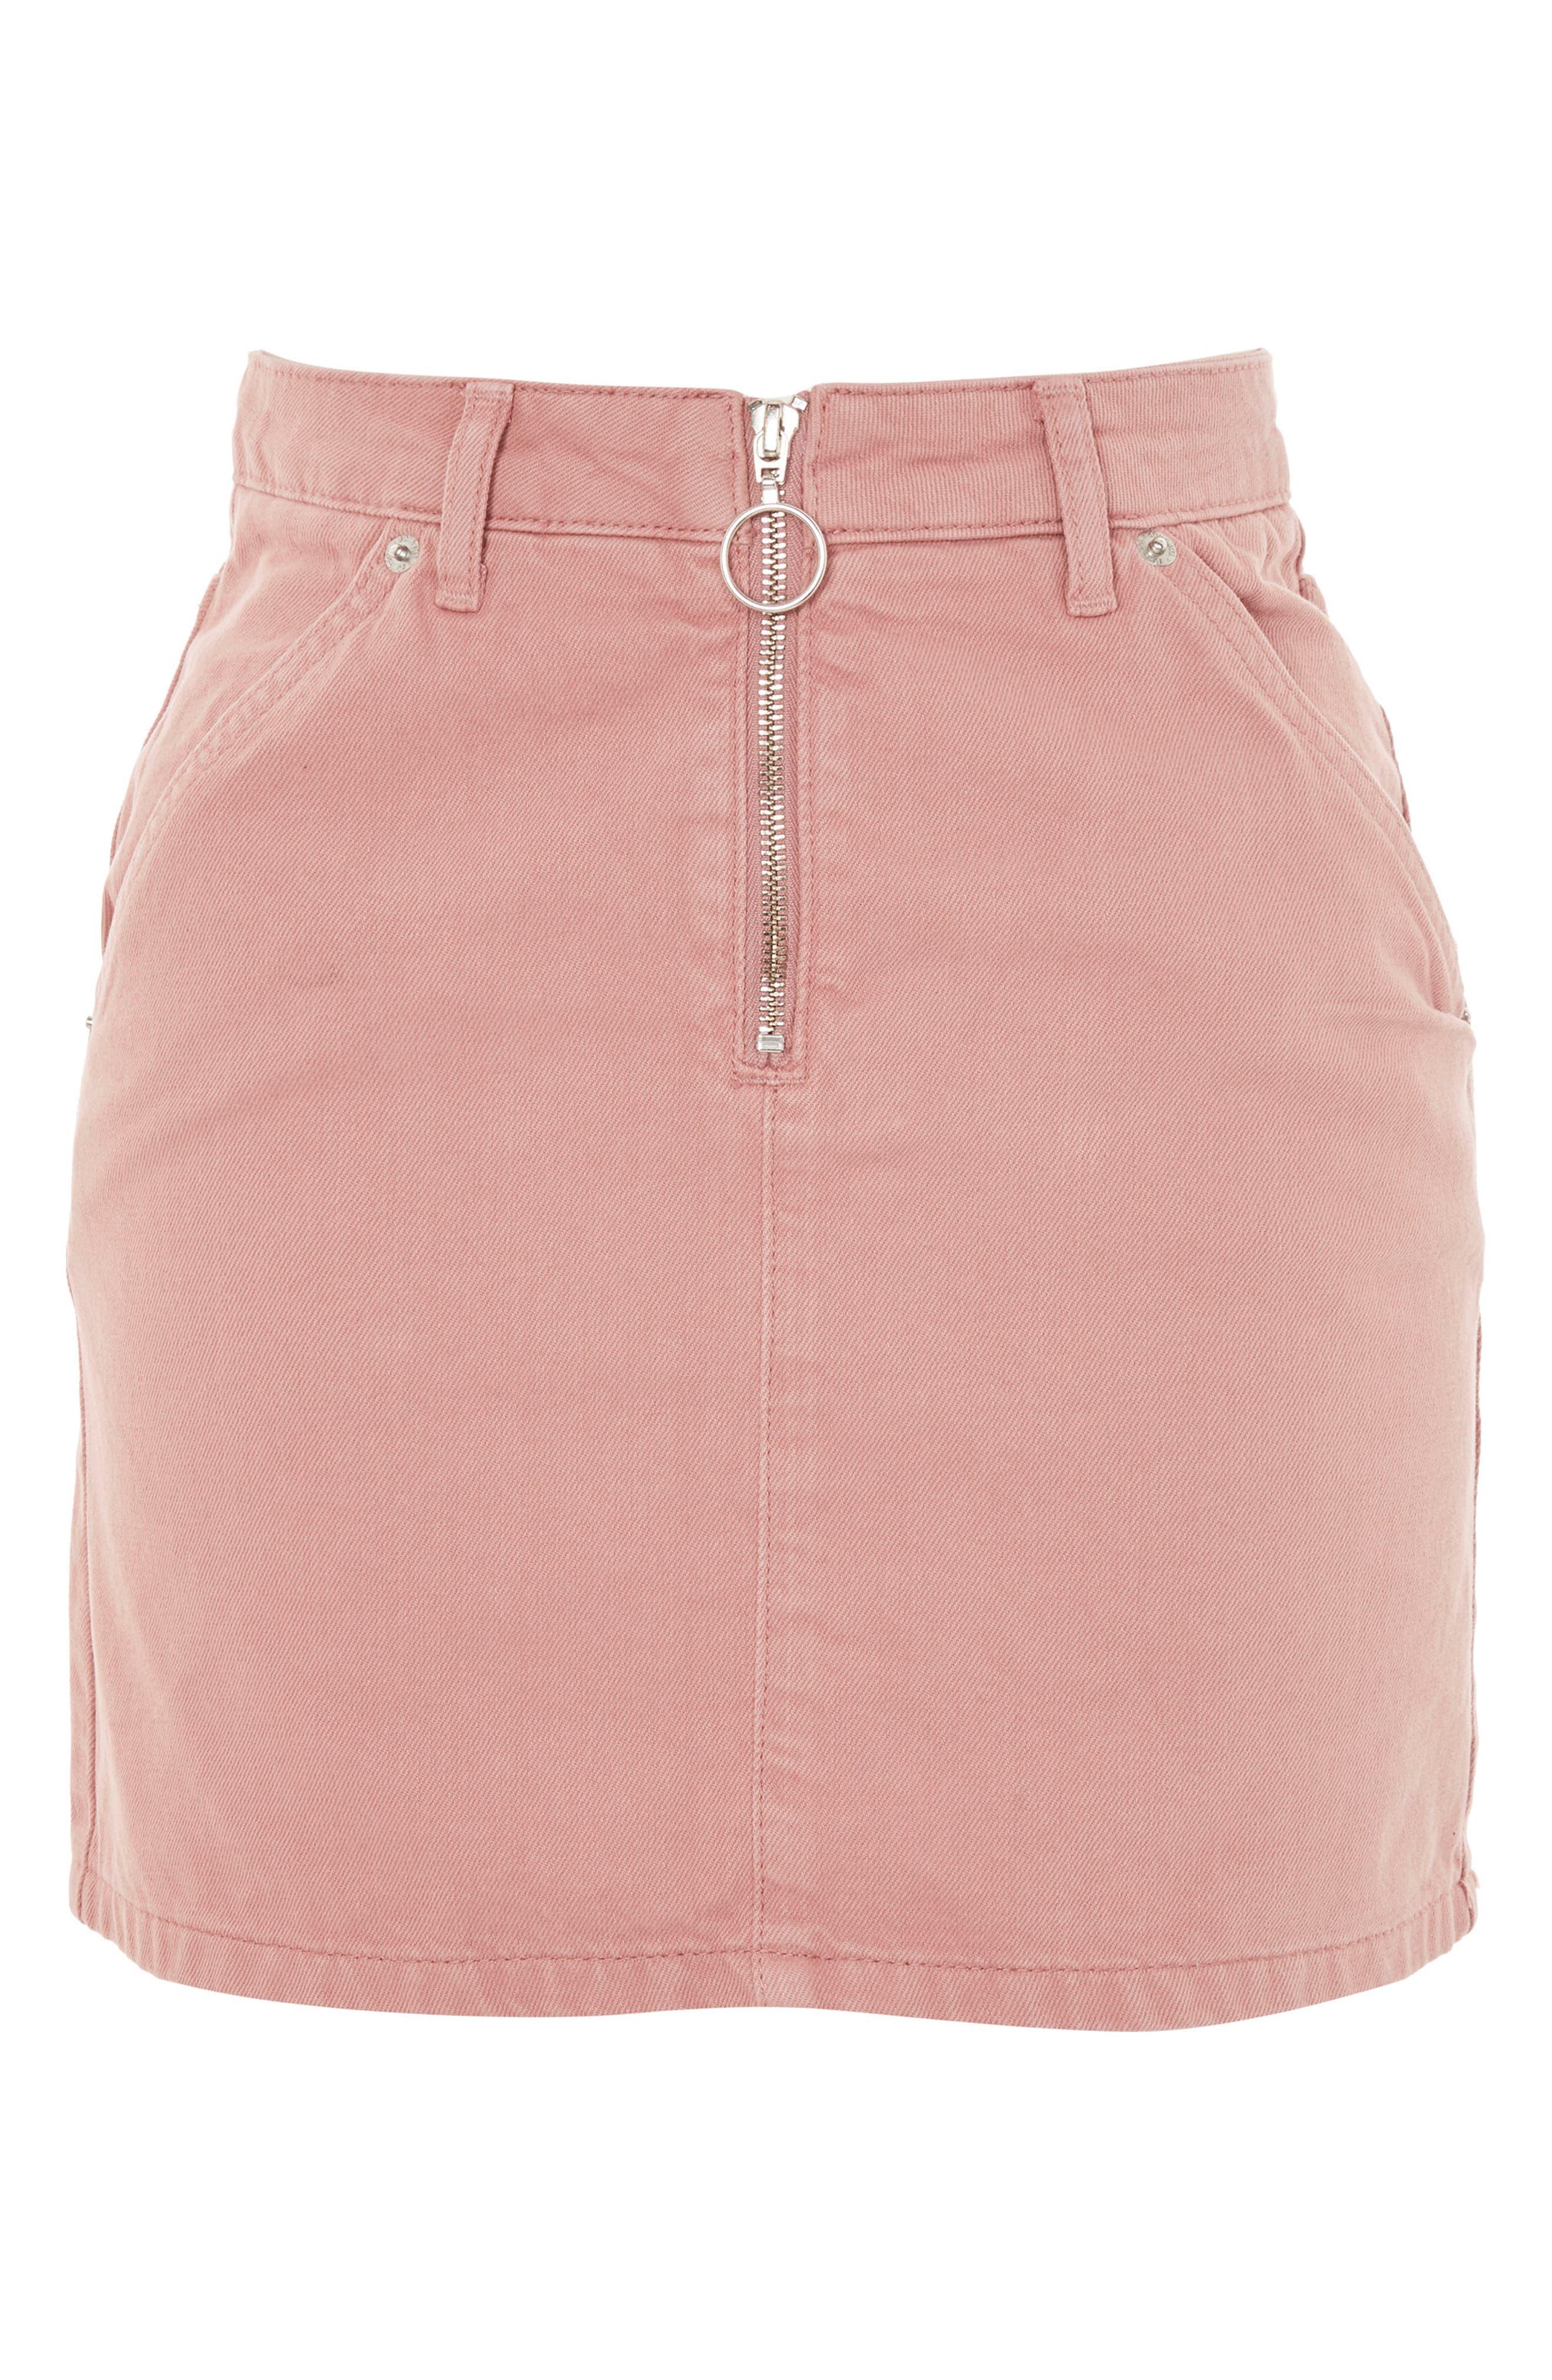 Half Zip Denim Skirt,                             Alternate thumbnail 3, color,                             Rose